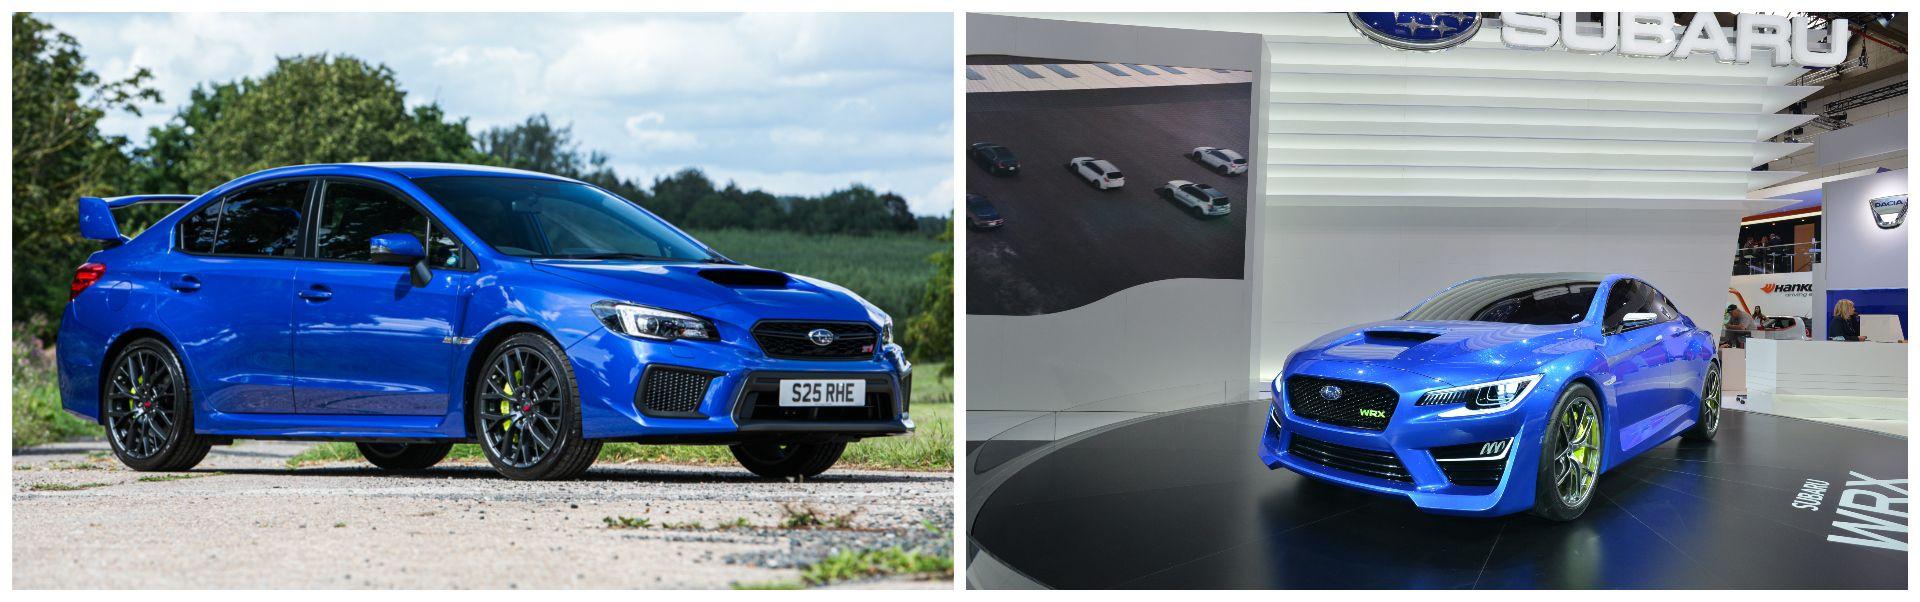 Subaru WRX Concept / WRX STI